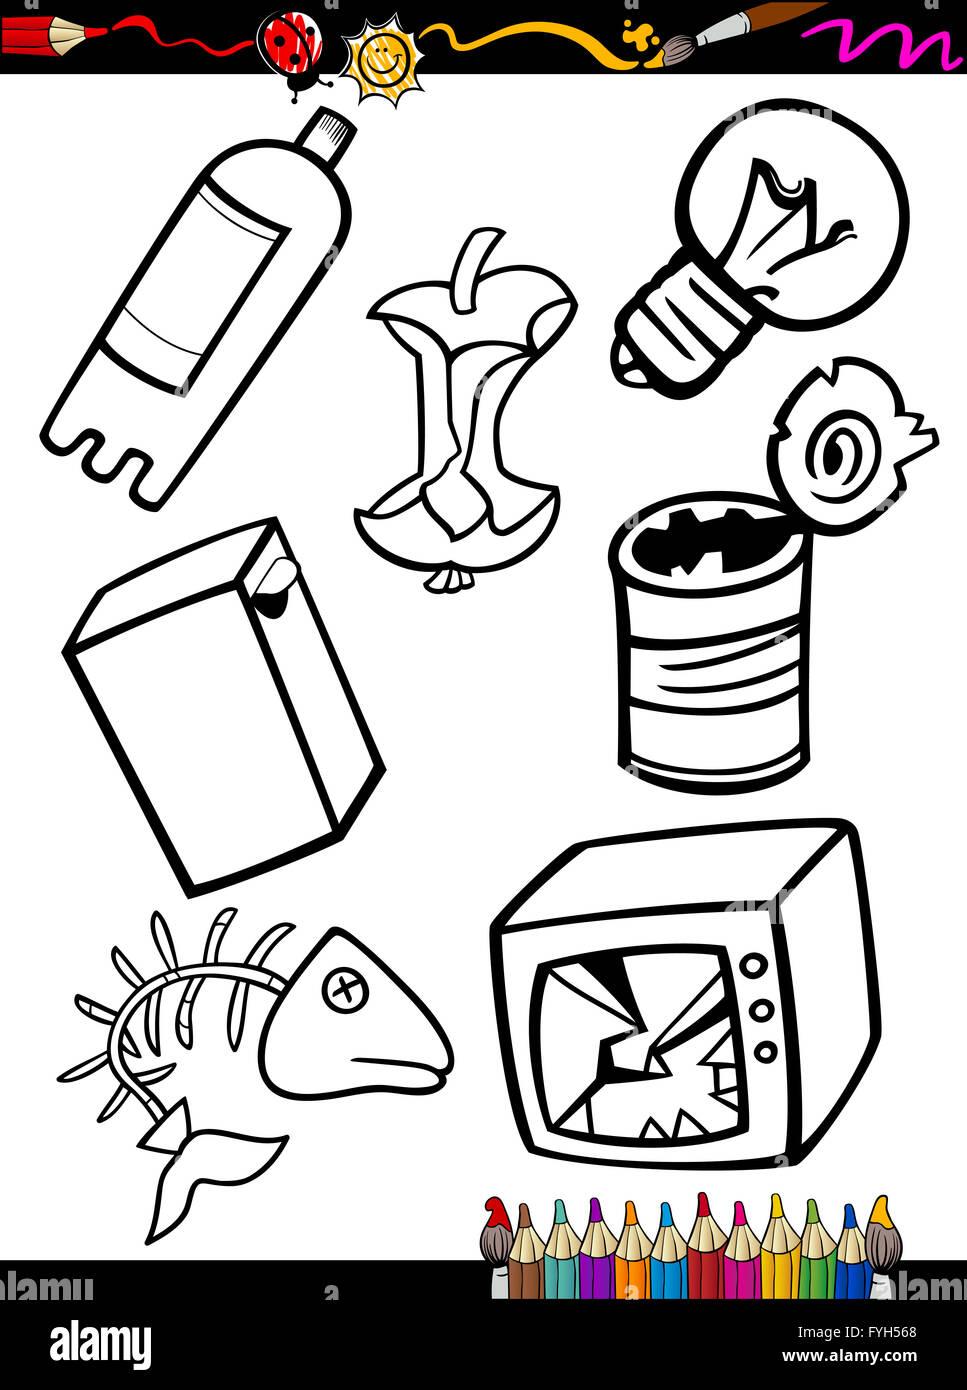 Cartoon Malvorlagen Müll-Objekte Stockfoto, Bild: 103024832 - Alamy